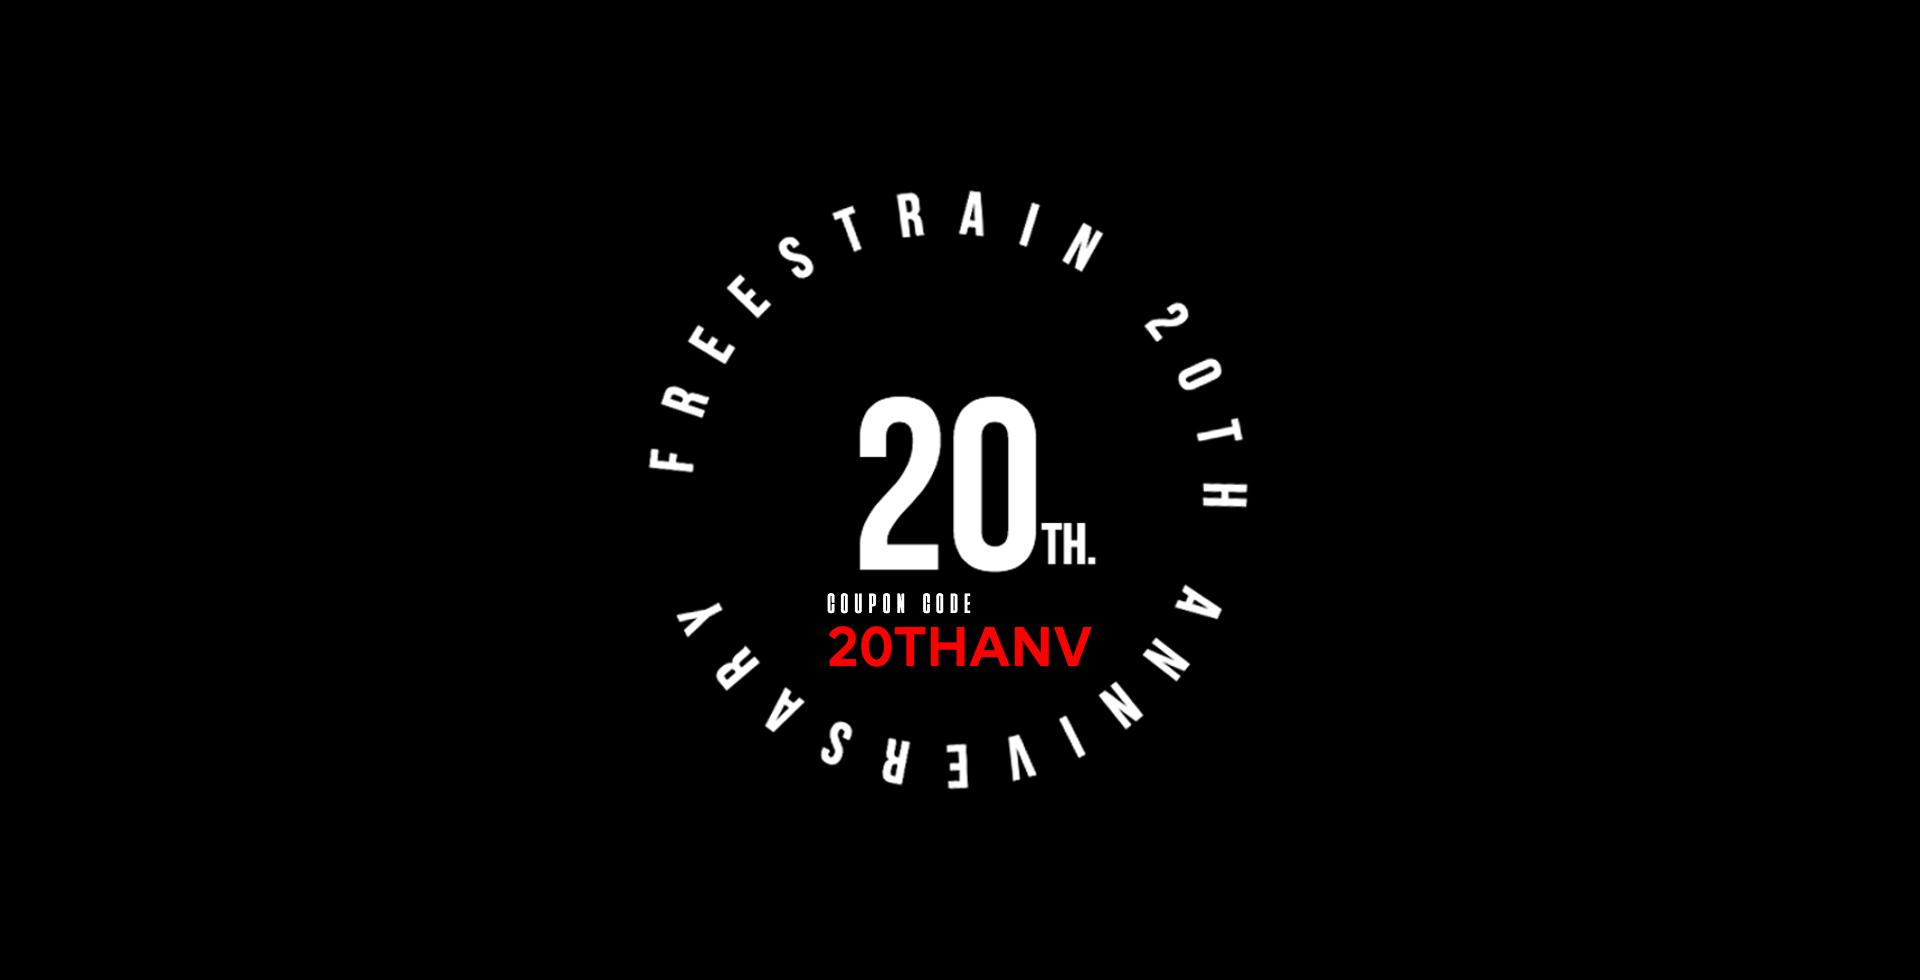 FreeStrain 20th Anniversary